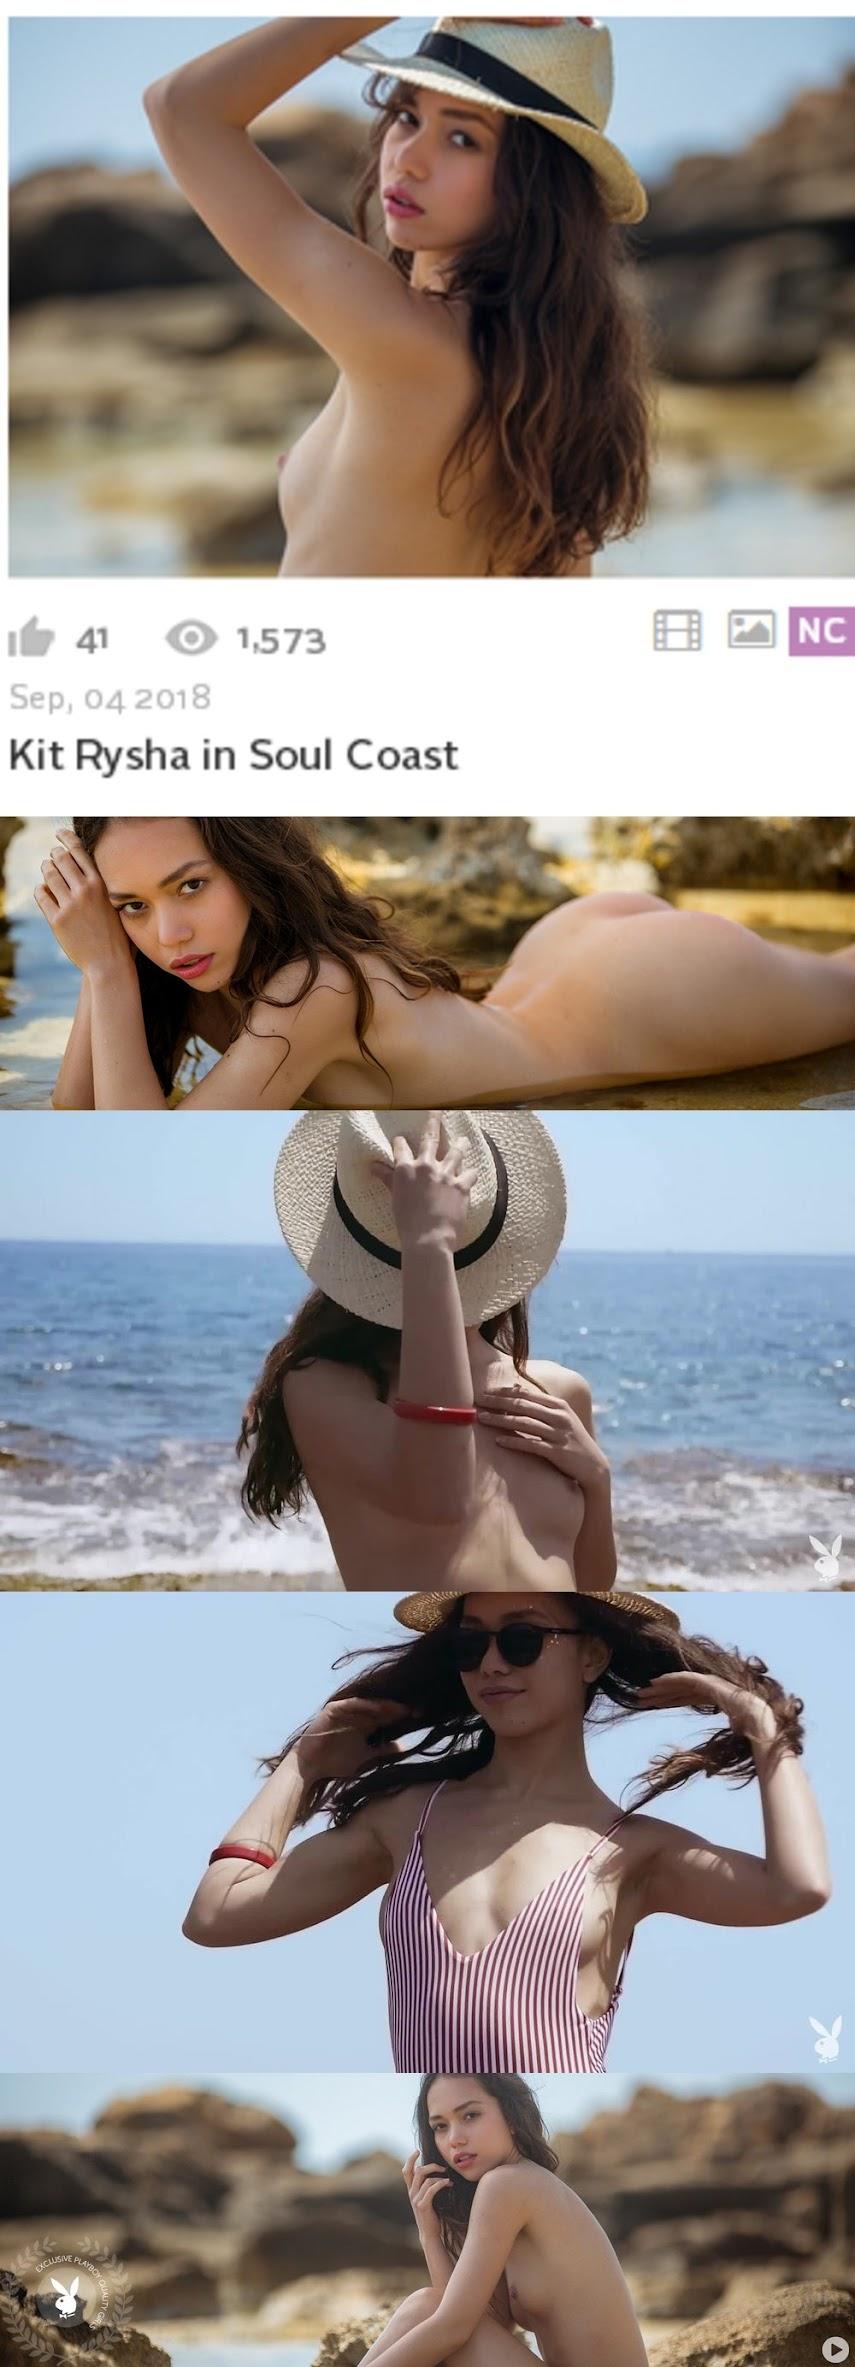 Playboy PlayboyPlus2018-09-04 Kit Rysha in Soul Coast